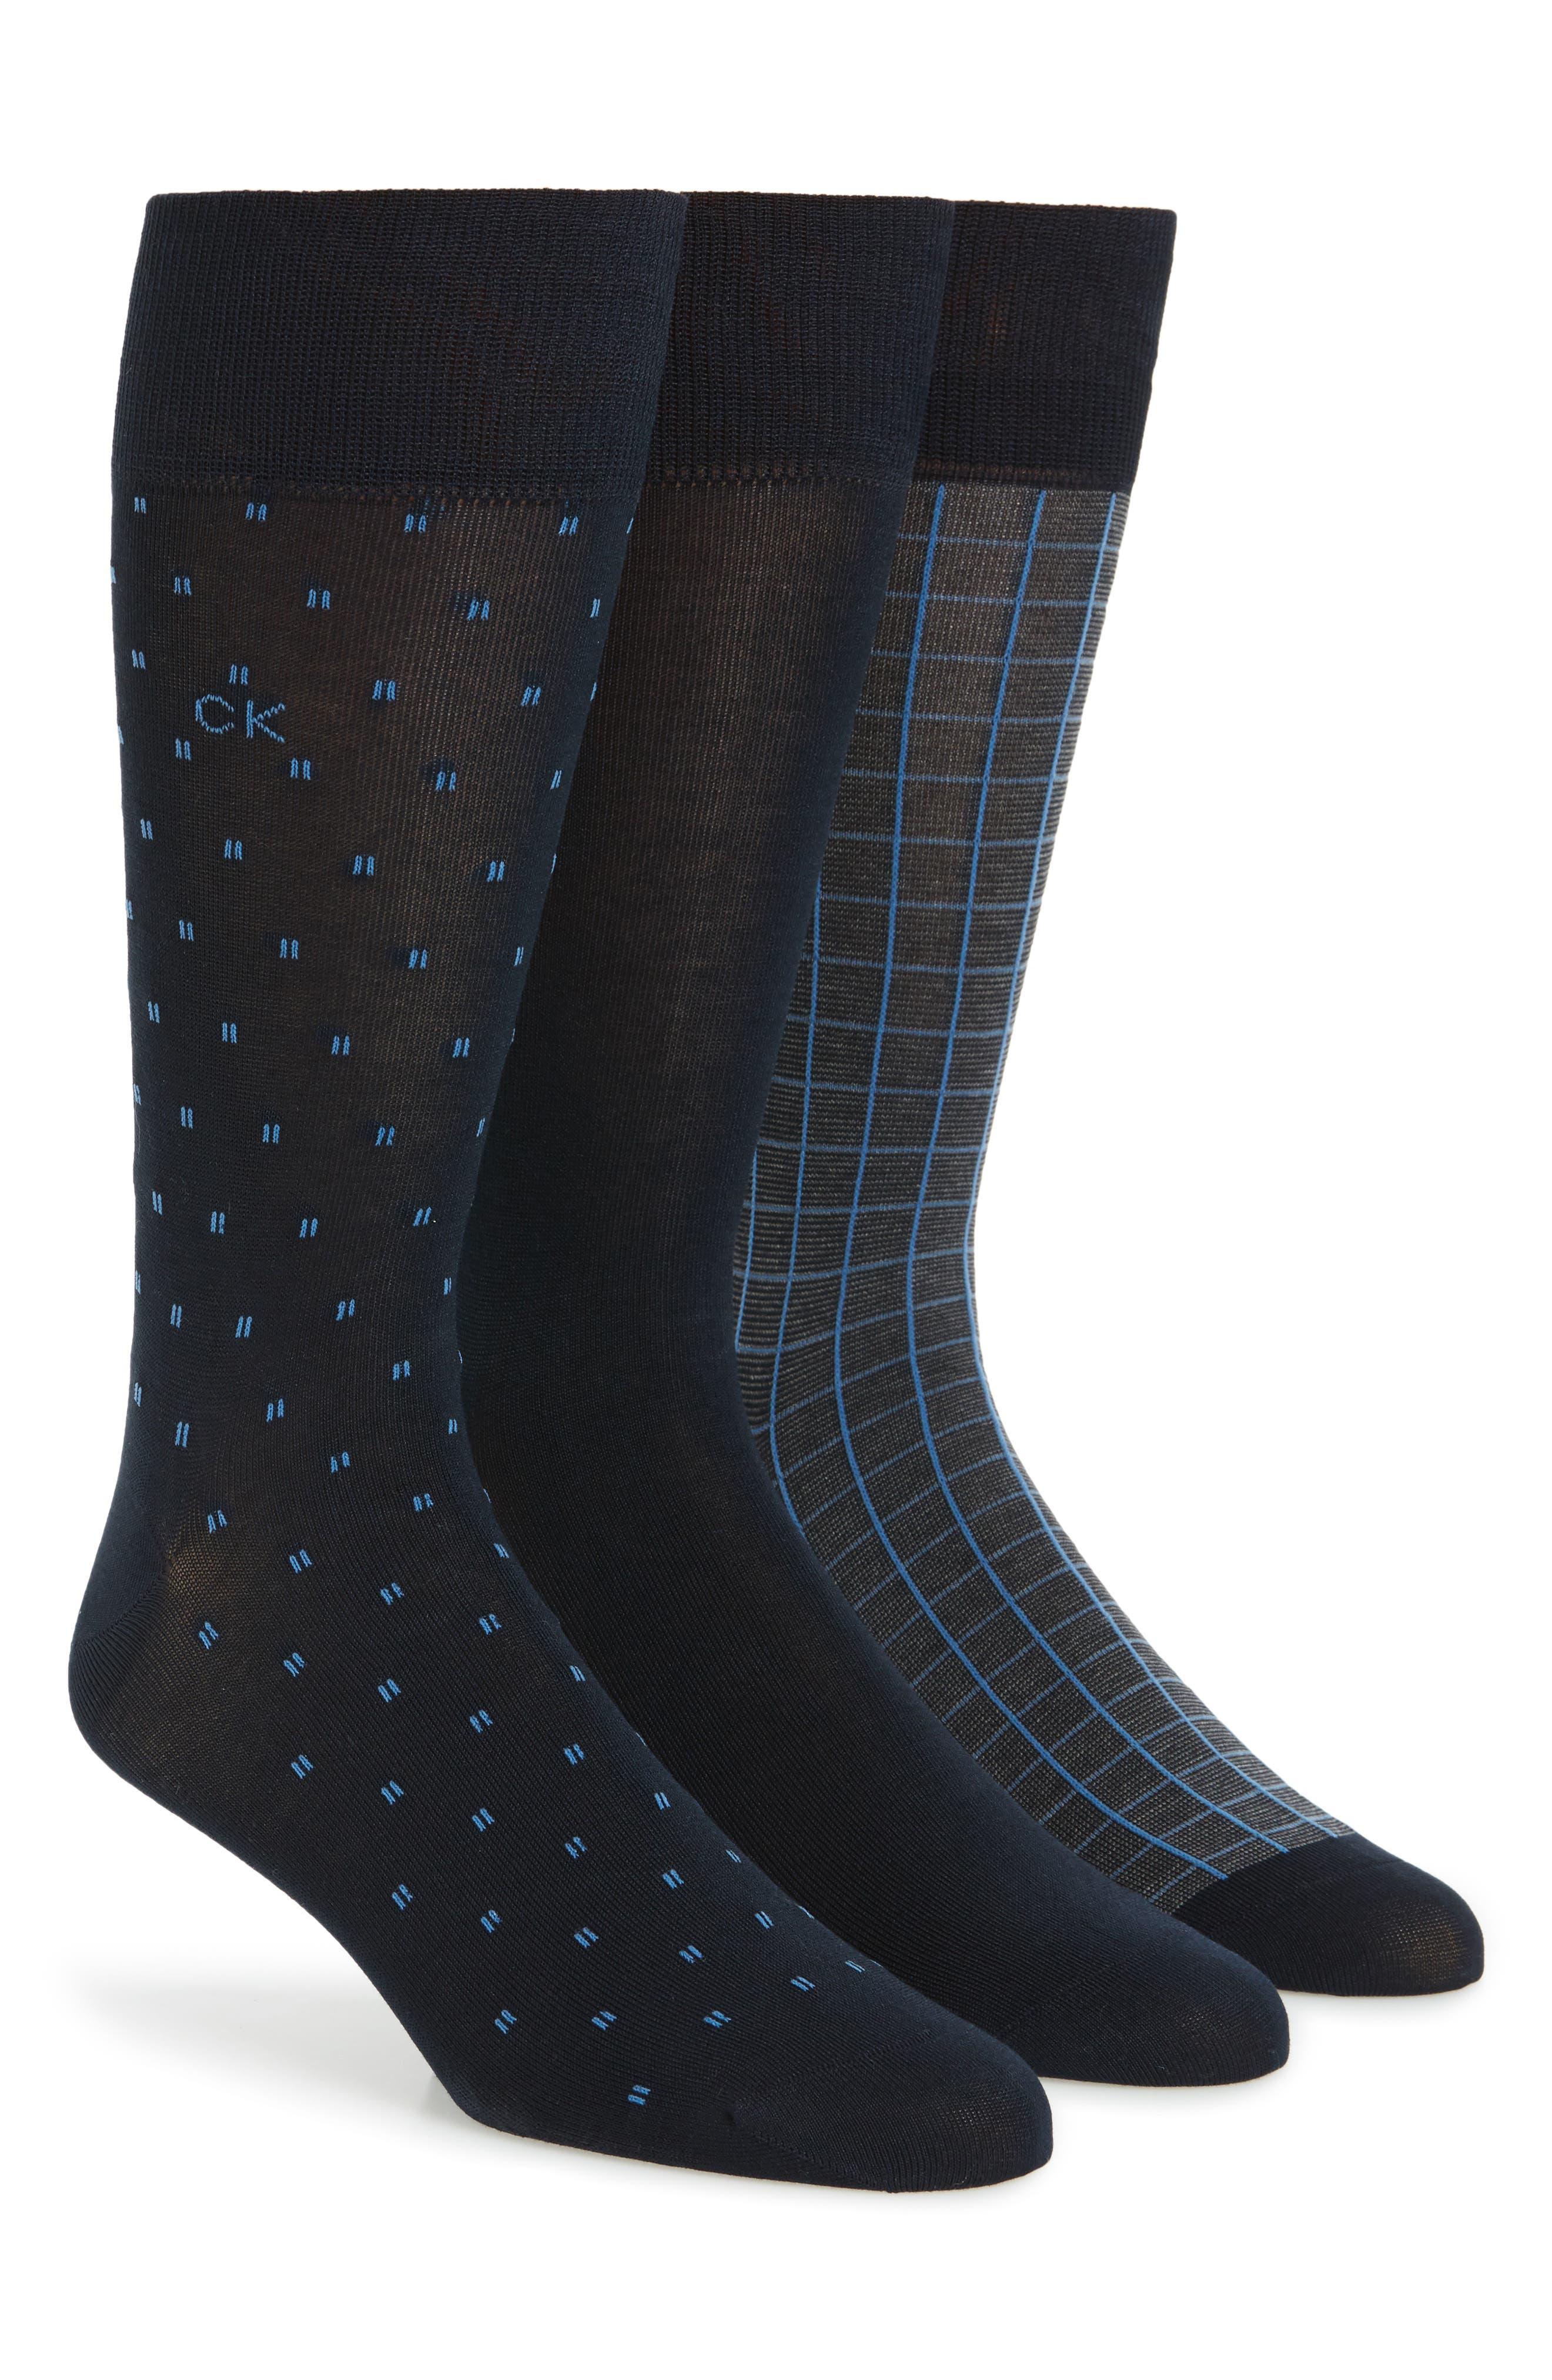 3-Pack Socks,                         Main,                         color, Navy